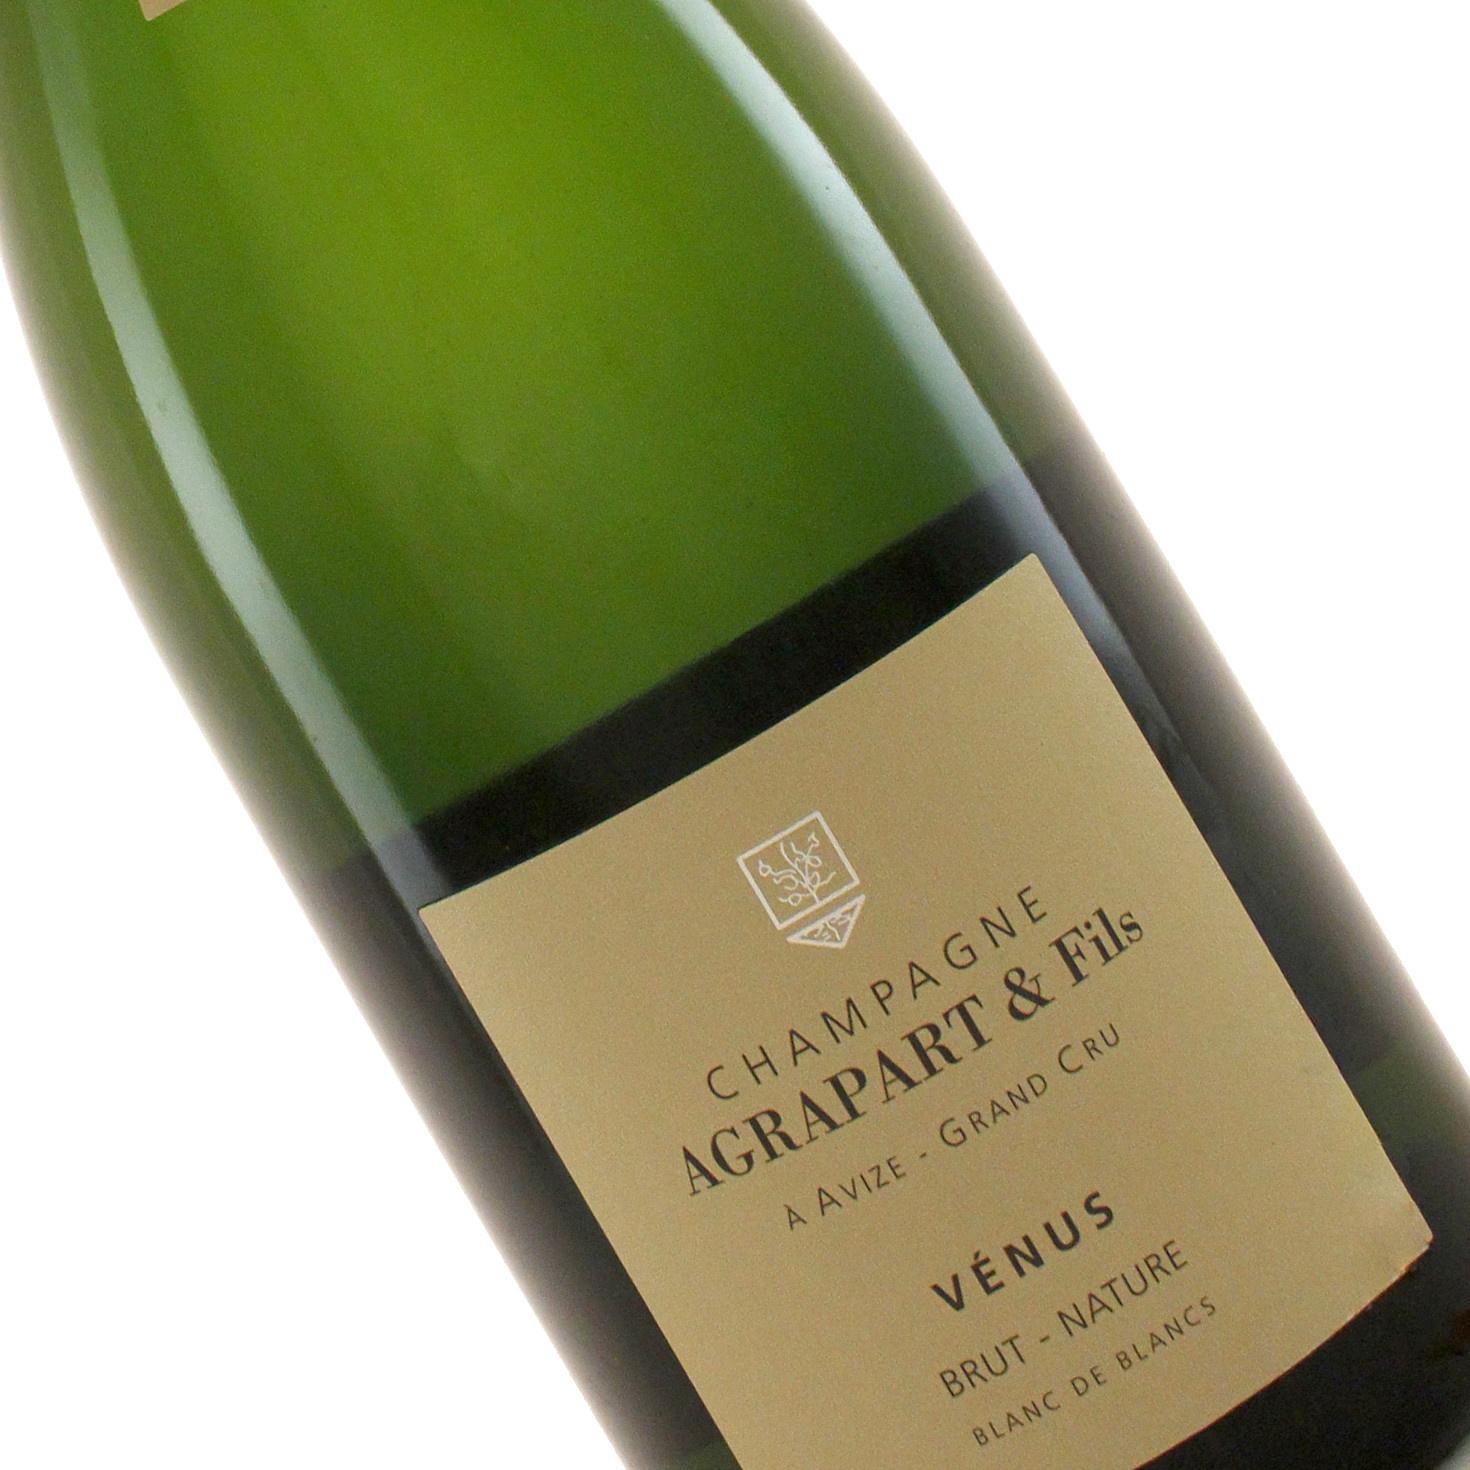 Agrapart & Fils 2010 Venus Blanc de Blancs Brut Nature, Champagne Grand Cru, Avize